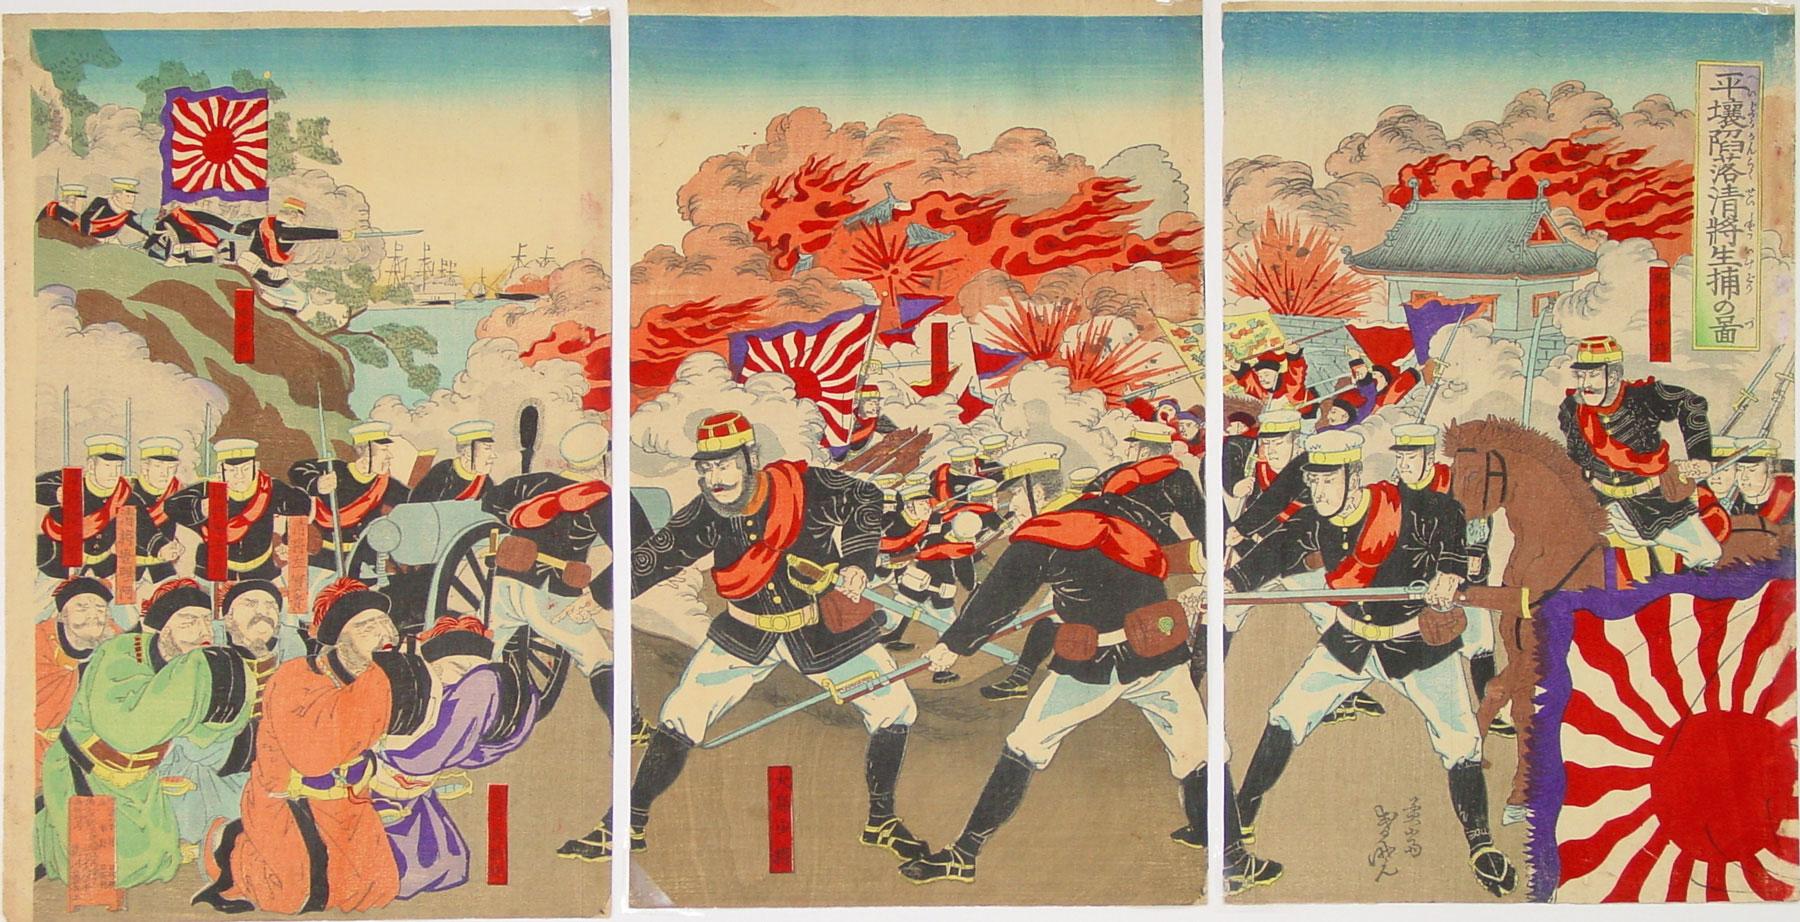 çin japon savaşı